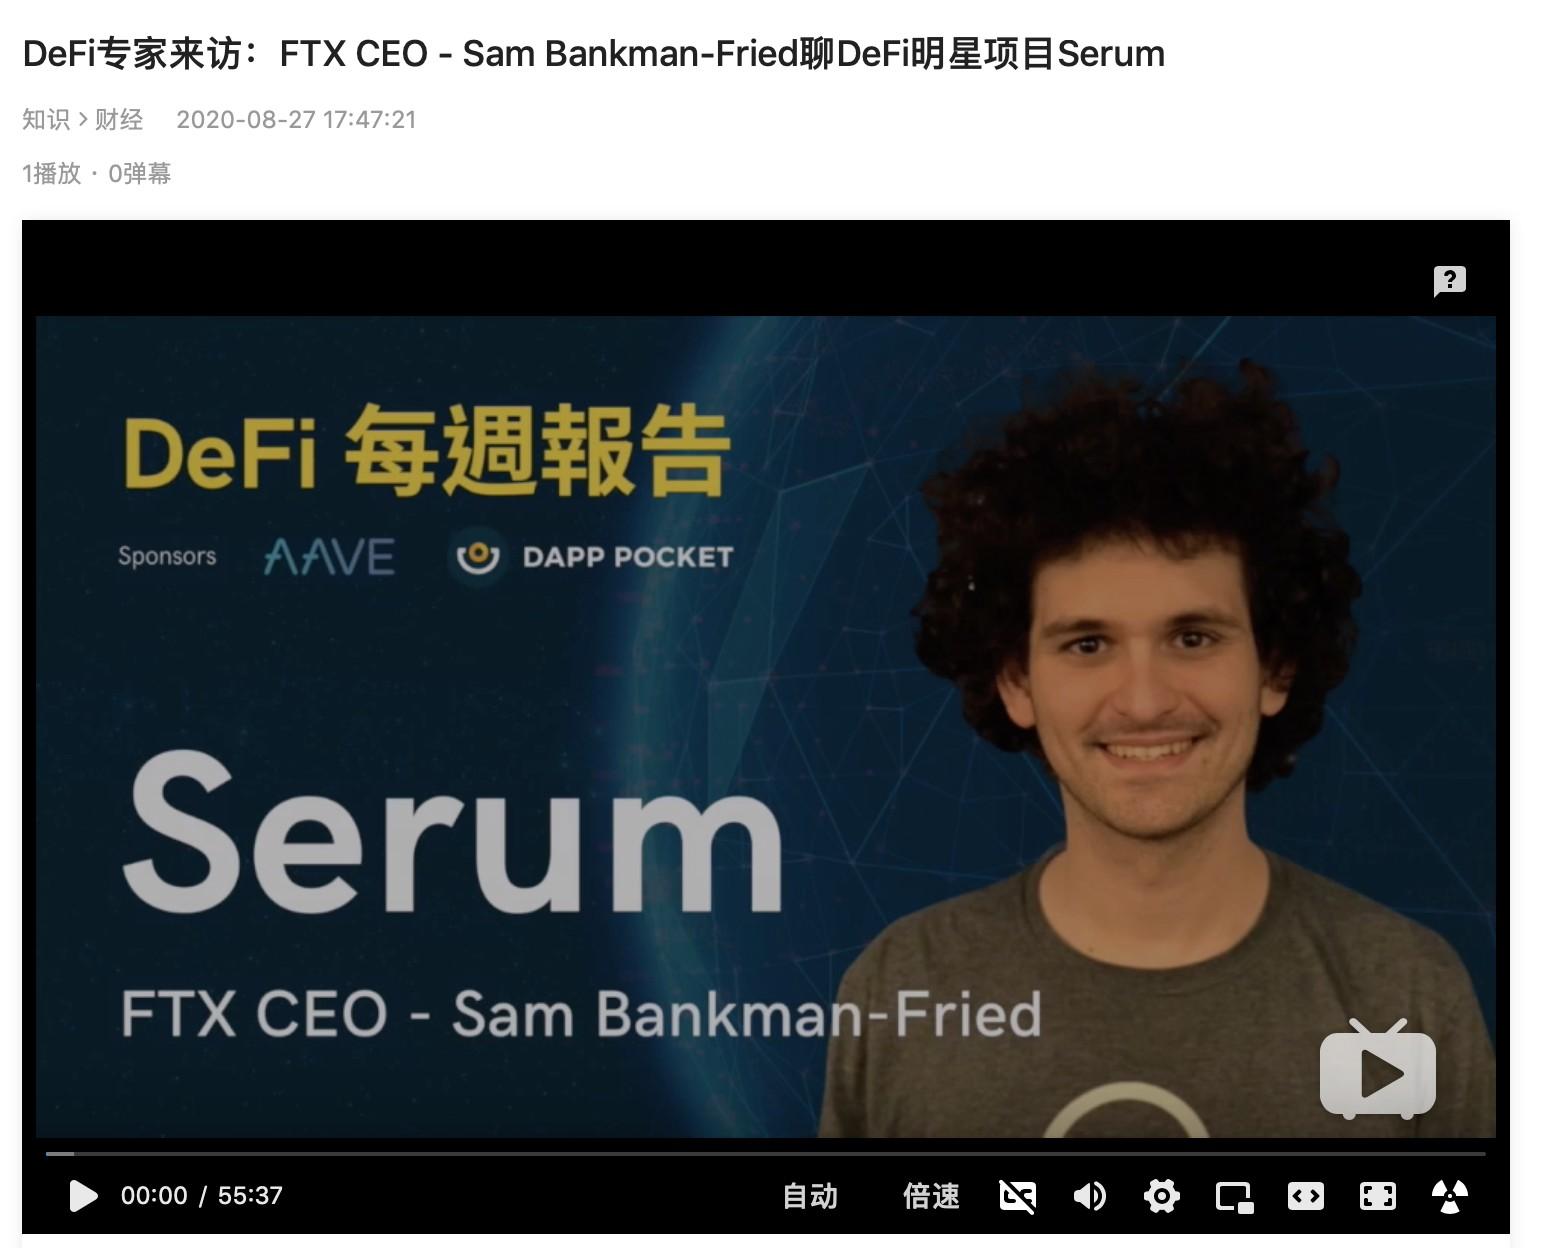 DeFi 专家来访:FTX CEO SBF 讲解去中心化跨链交易所 Serum